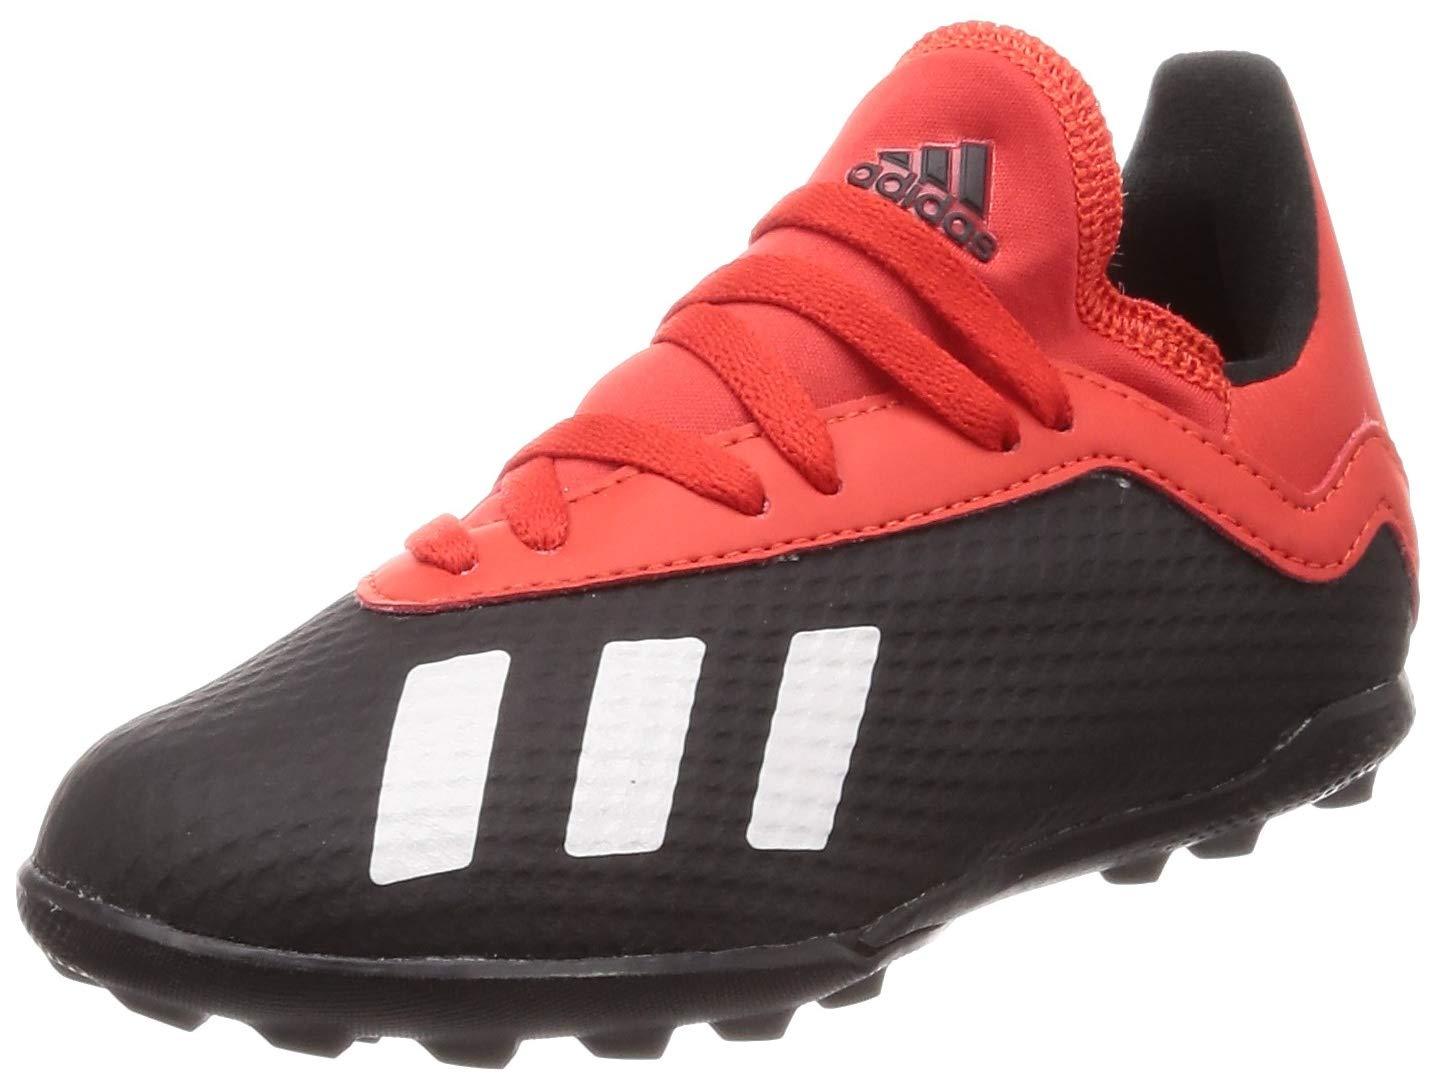 Adidas Kinder Fussballschuhe X 18.3 TF J